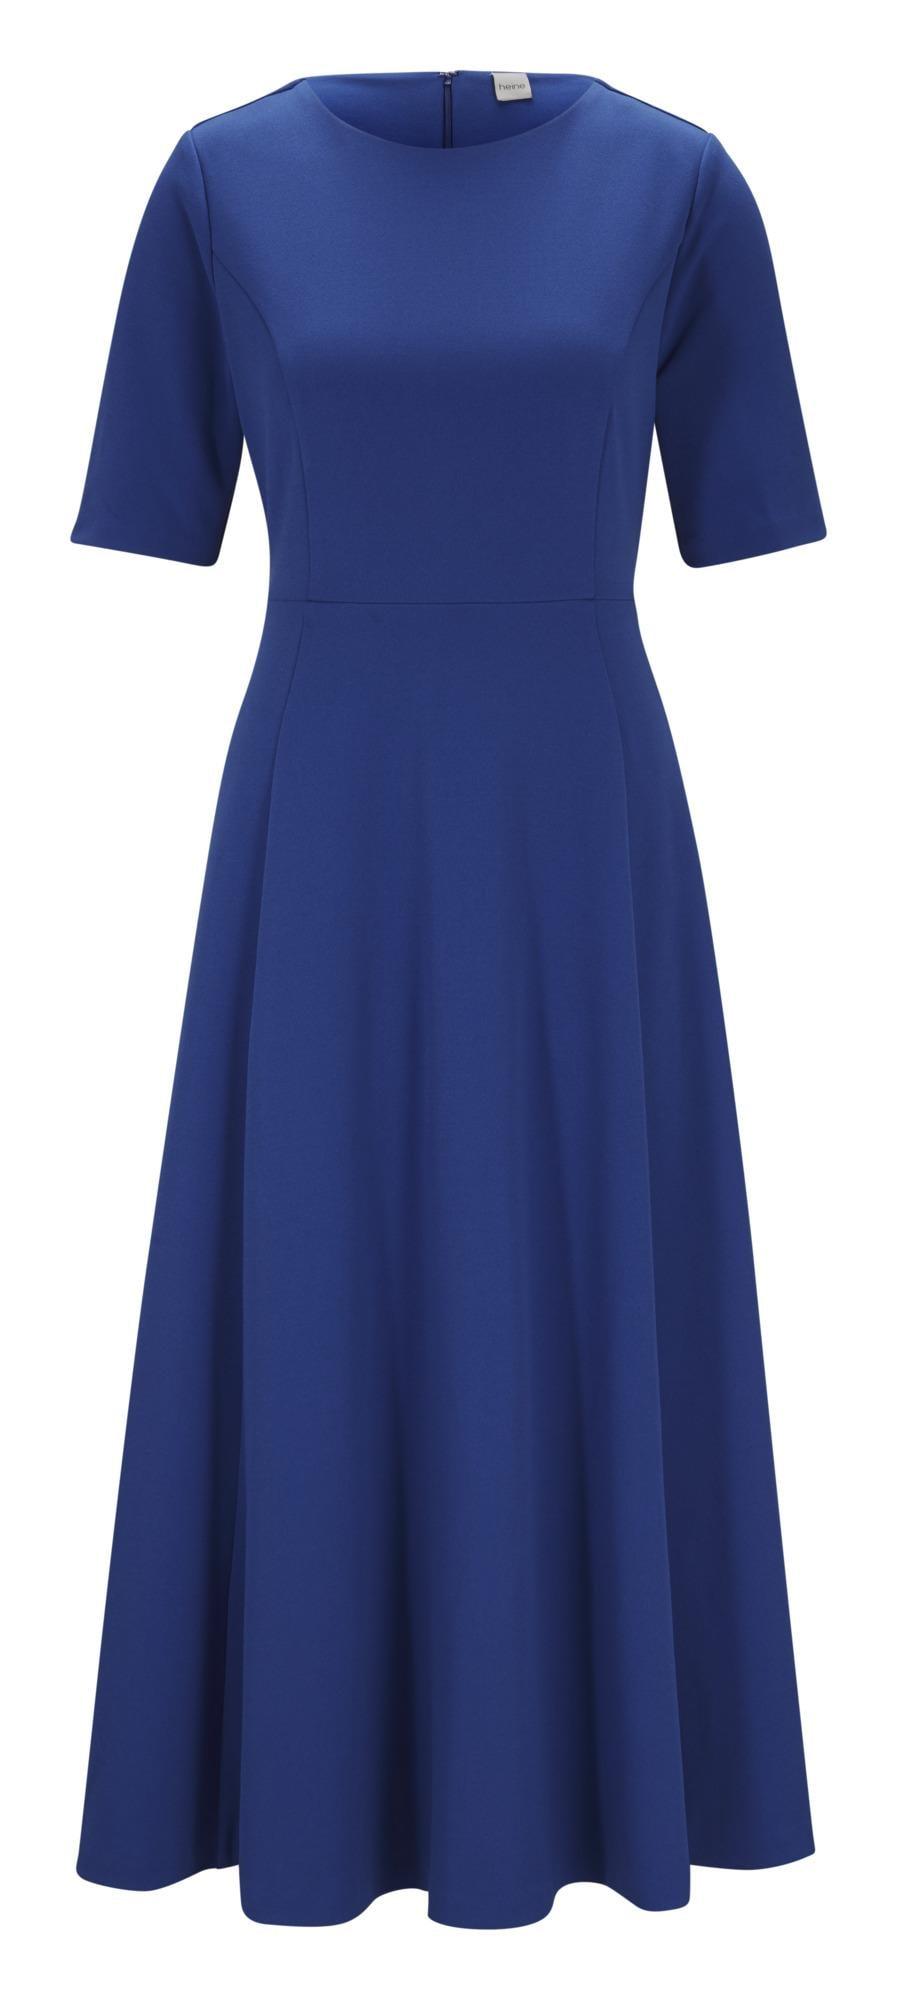 "heine Suknelė sodri mėlyna (""karališka"")"